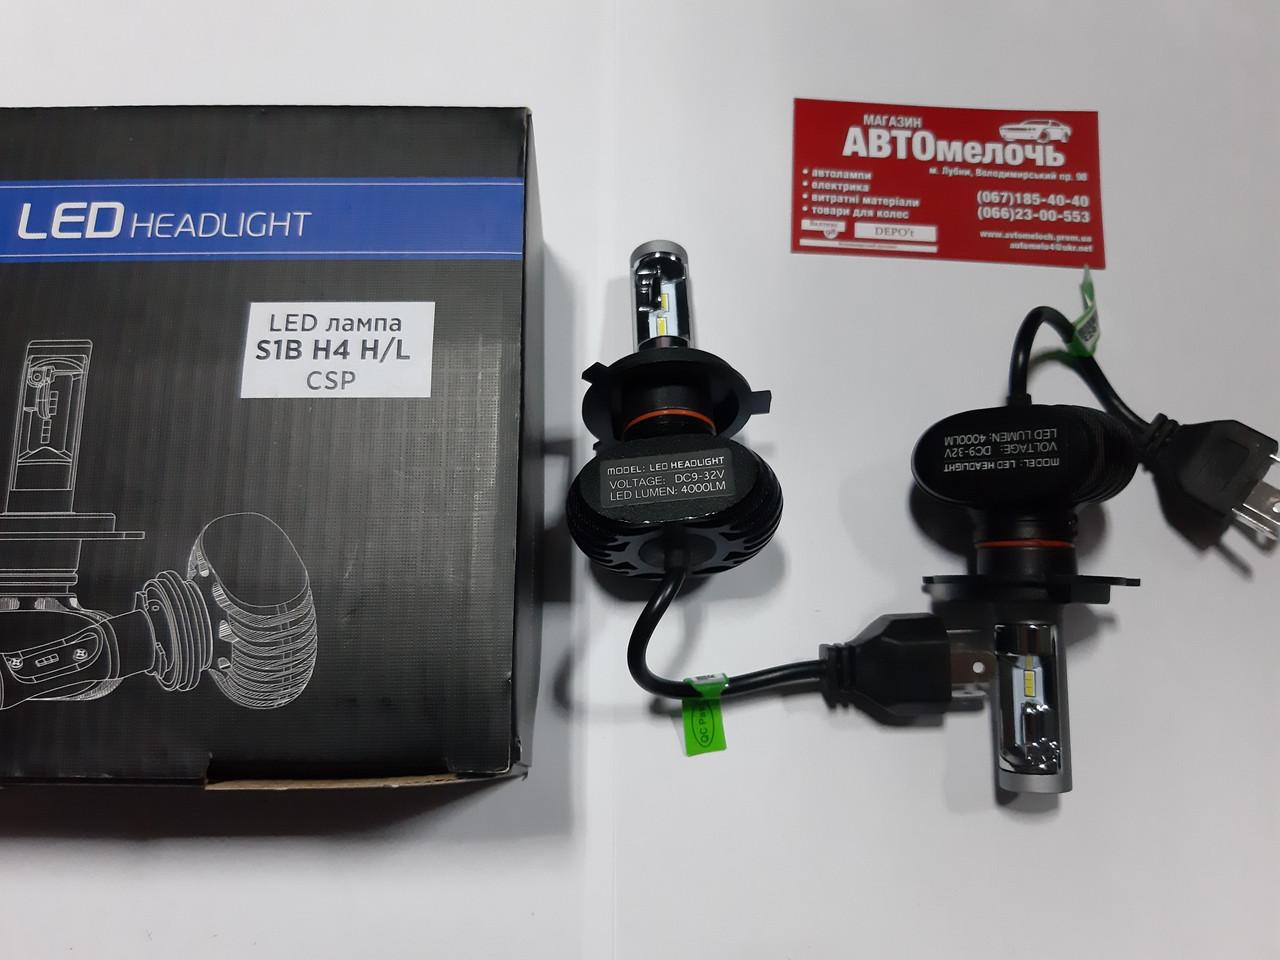 Лампа LED S1B серия H4 12-24V 25W 6000K 4000Lm к-т